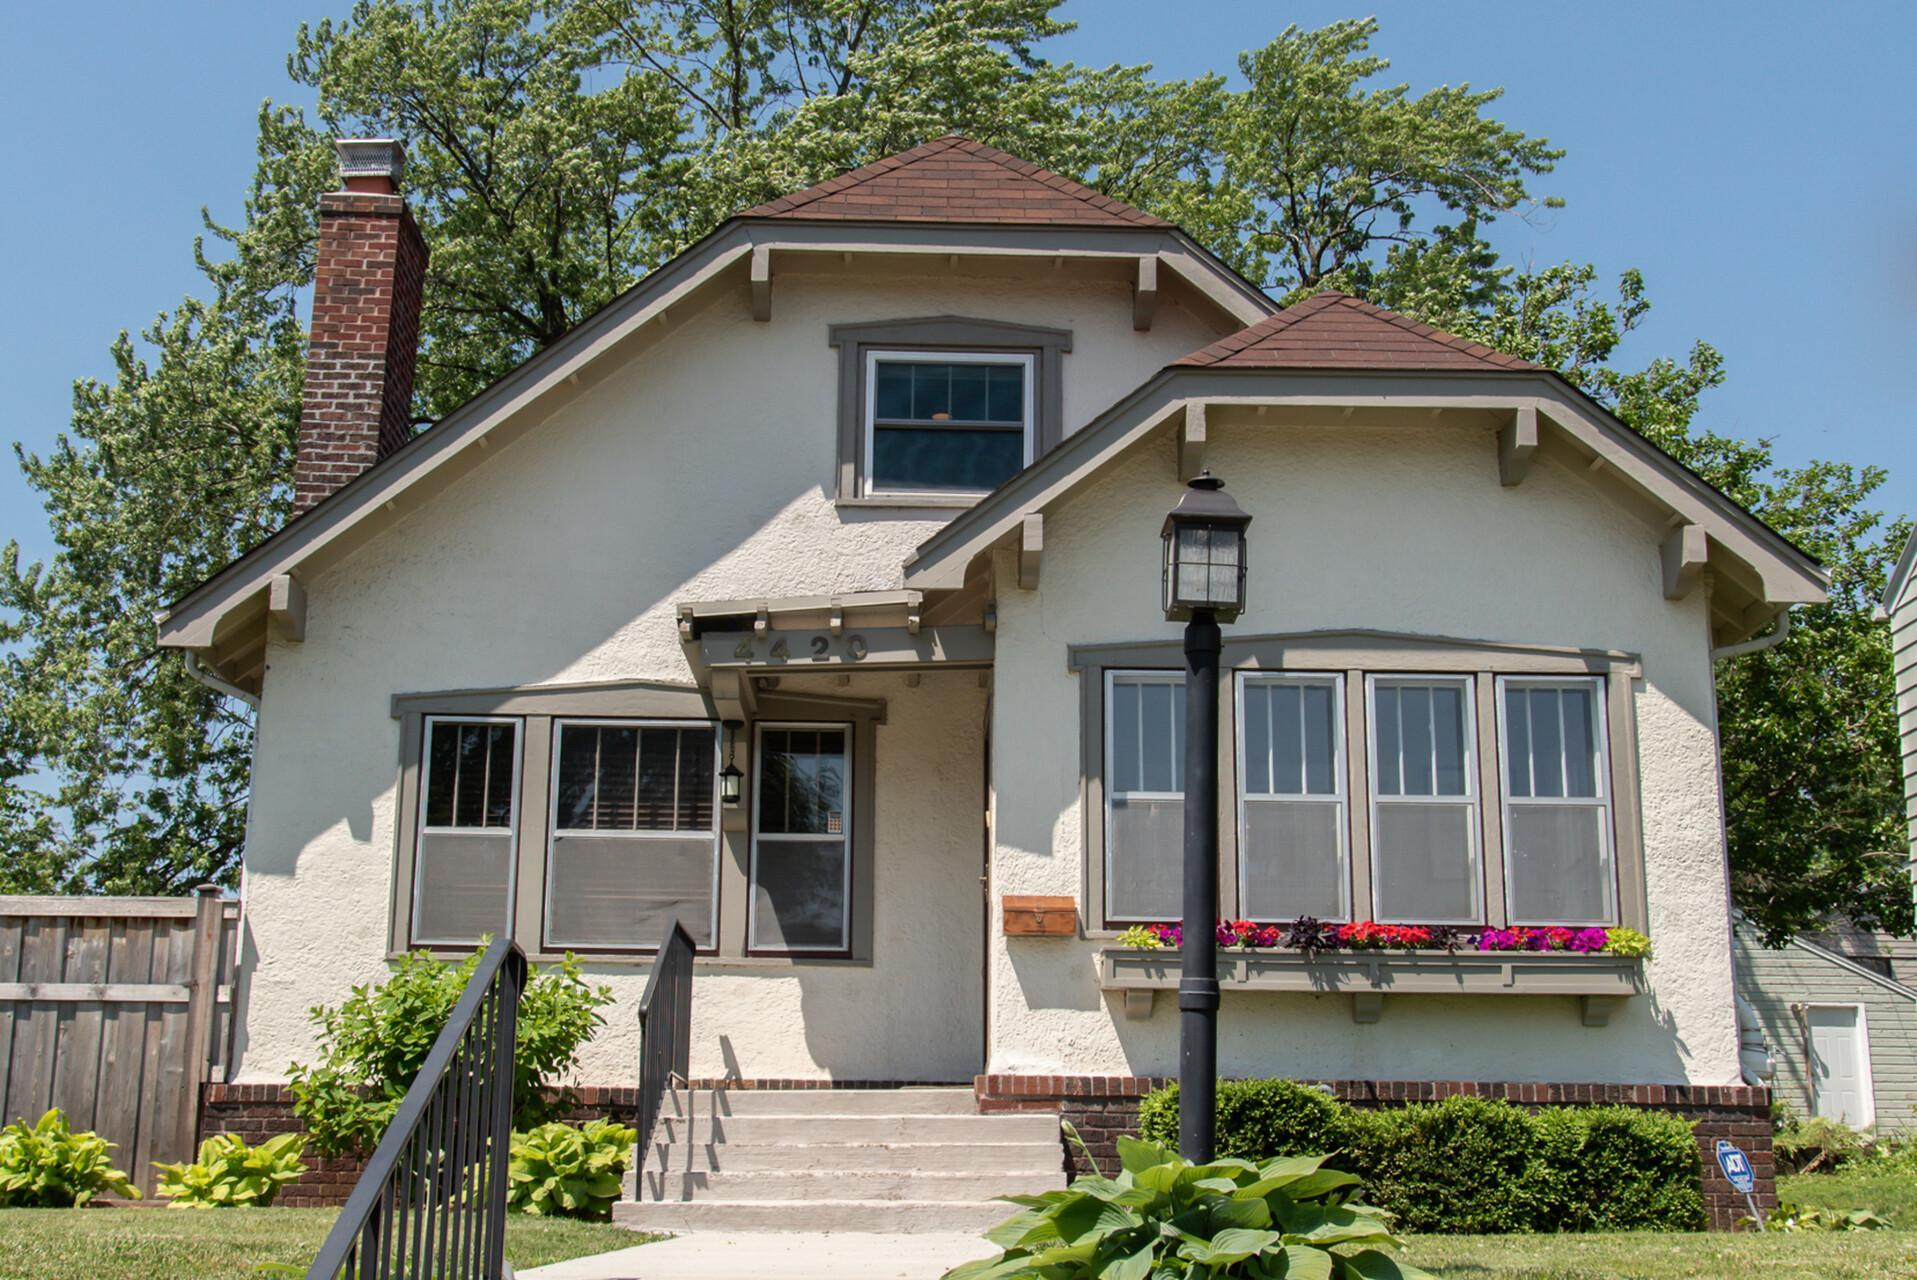 4420 Grand S Property Photo - Minneapolis, MN real estate listing